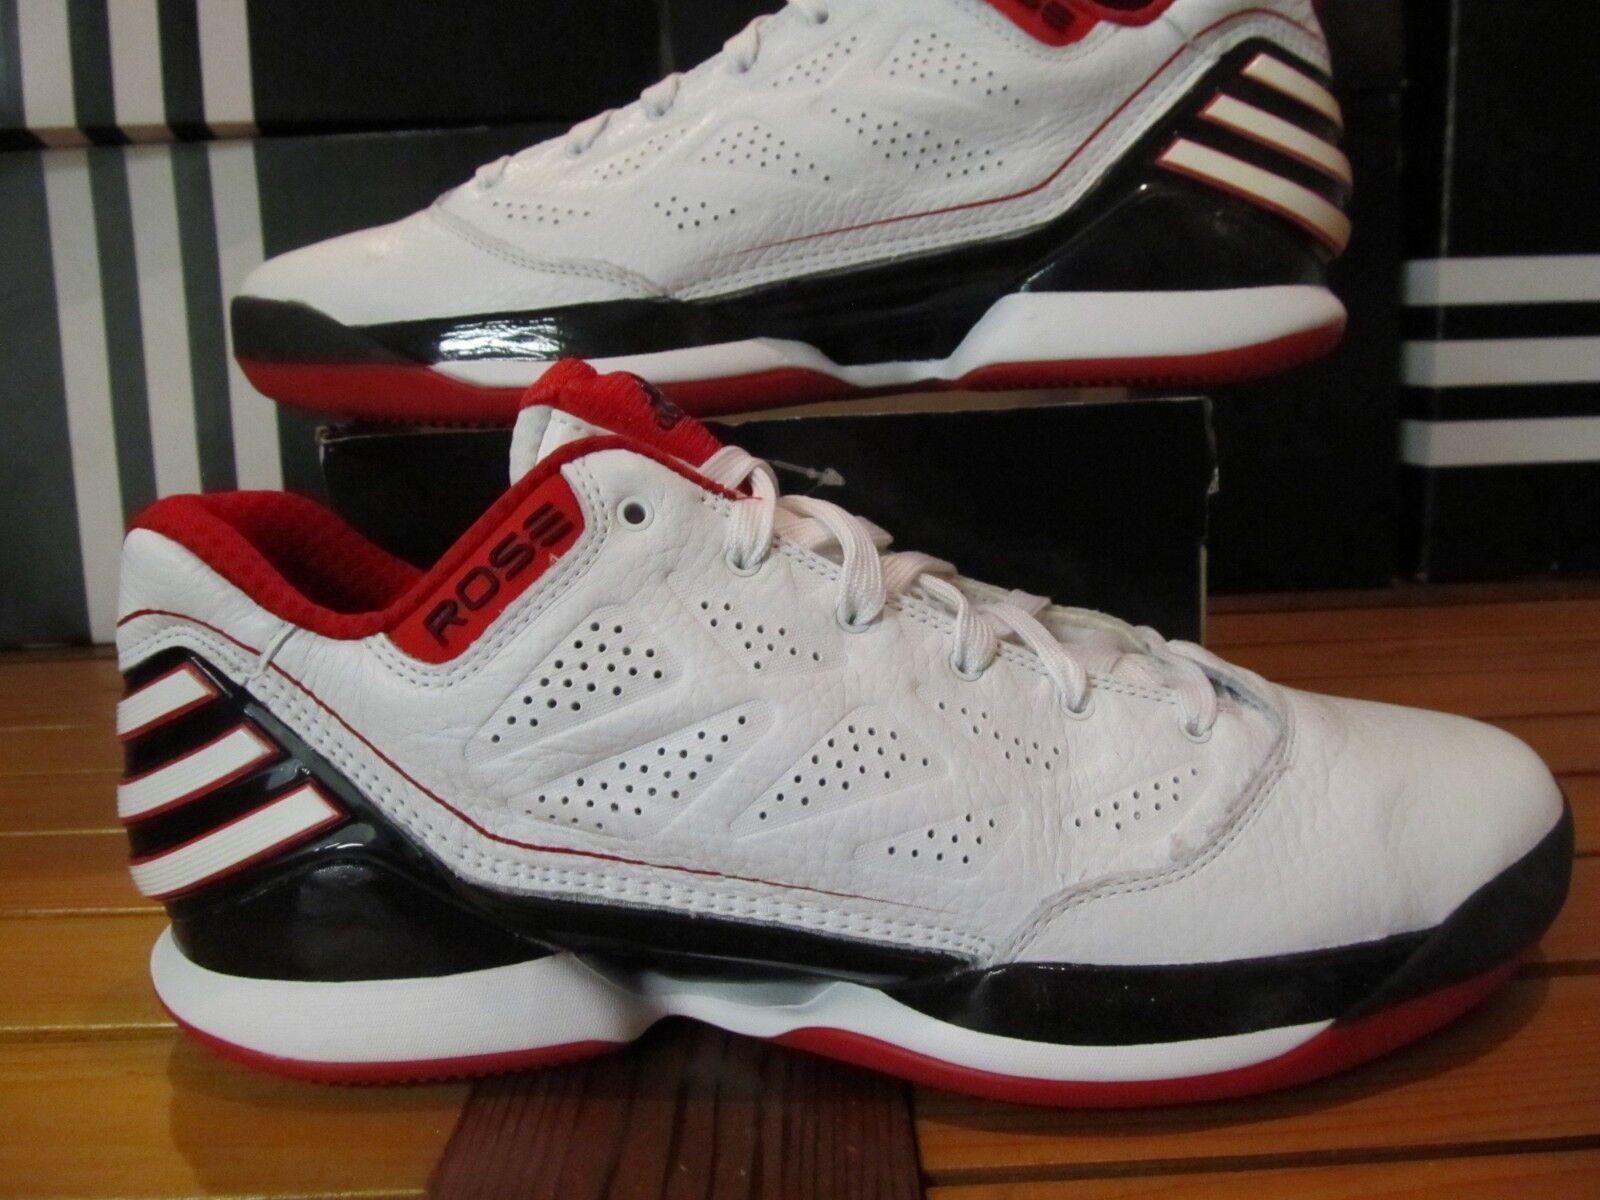 02e1f2cbe45 Adidas Rose 2.5 2.5 2.5 Lo Black White Red 11.5 G56190 9 8 Chicago Bulls D